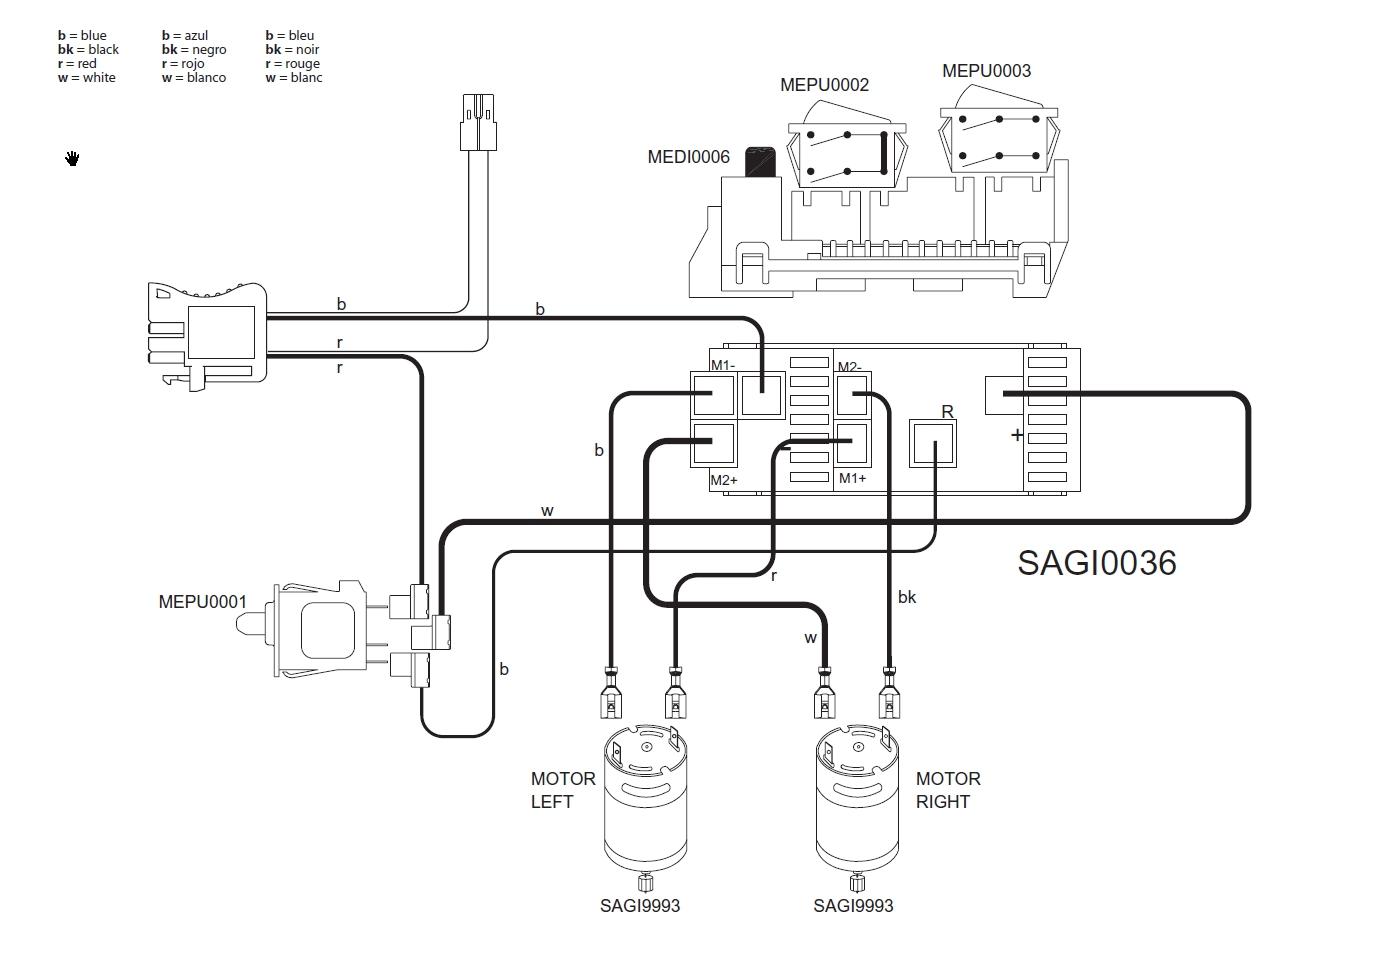 peg perego gator xuv 550 wiring diagram for 1986 chevy truck john deere